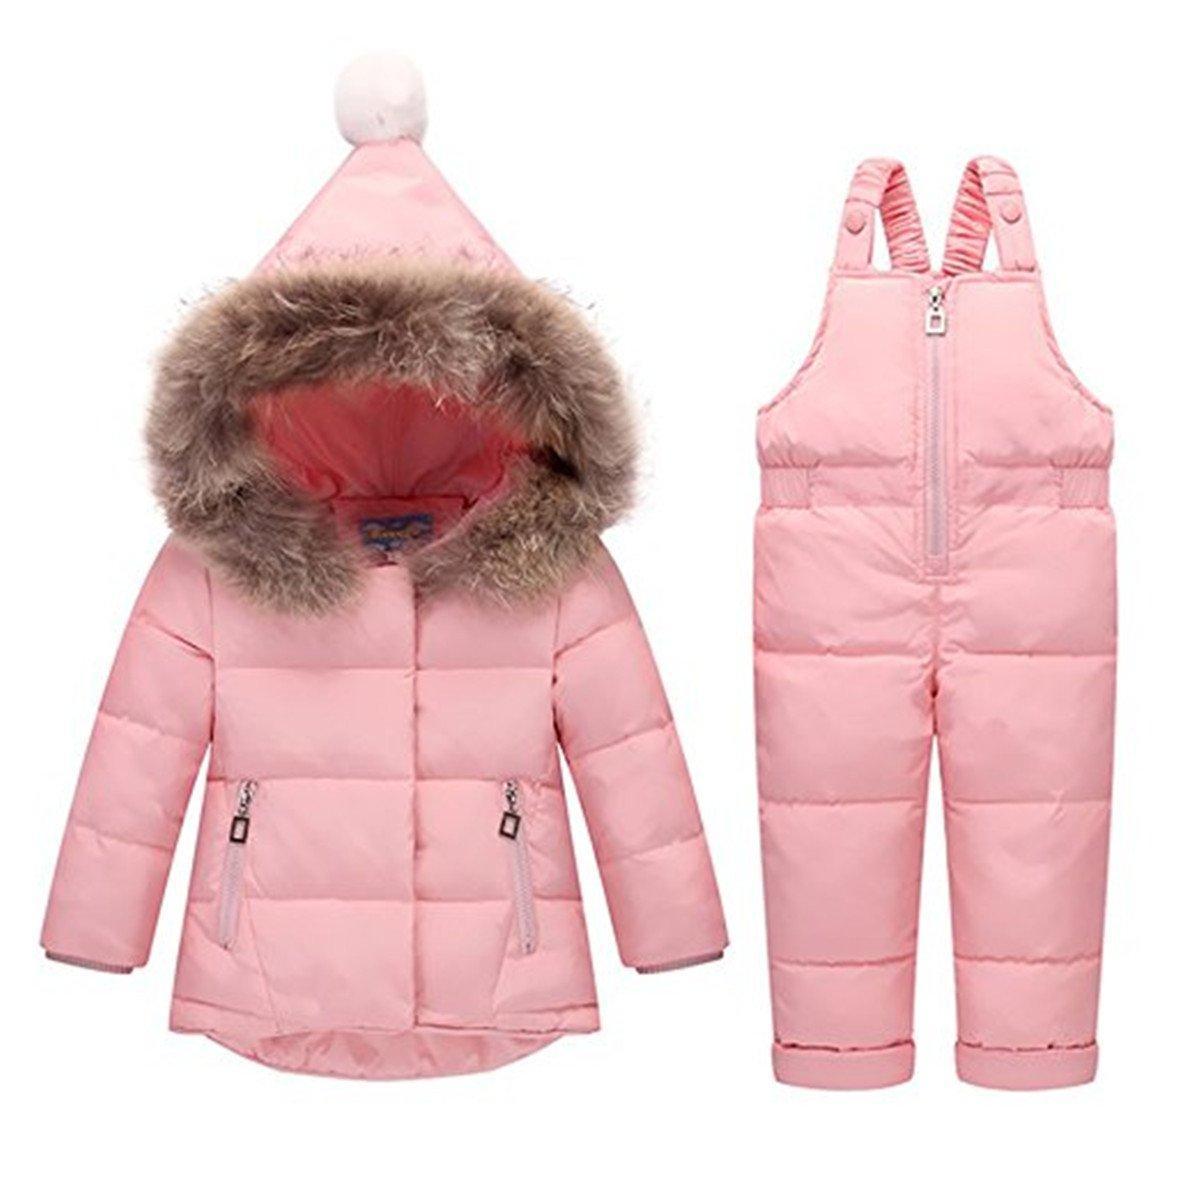 FAIRYRAIN Little Unisex Baby Two Piece Puffer Down Winter Warm Snowsuit Jacket With Snow Ski Bib Pants